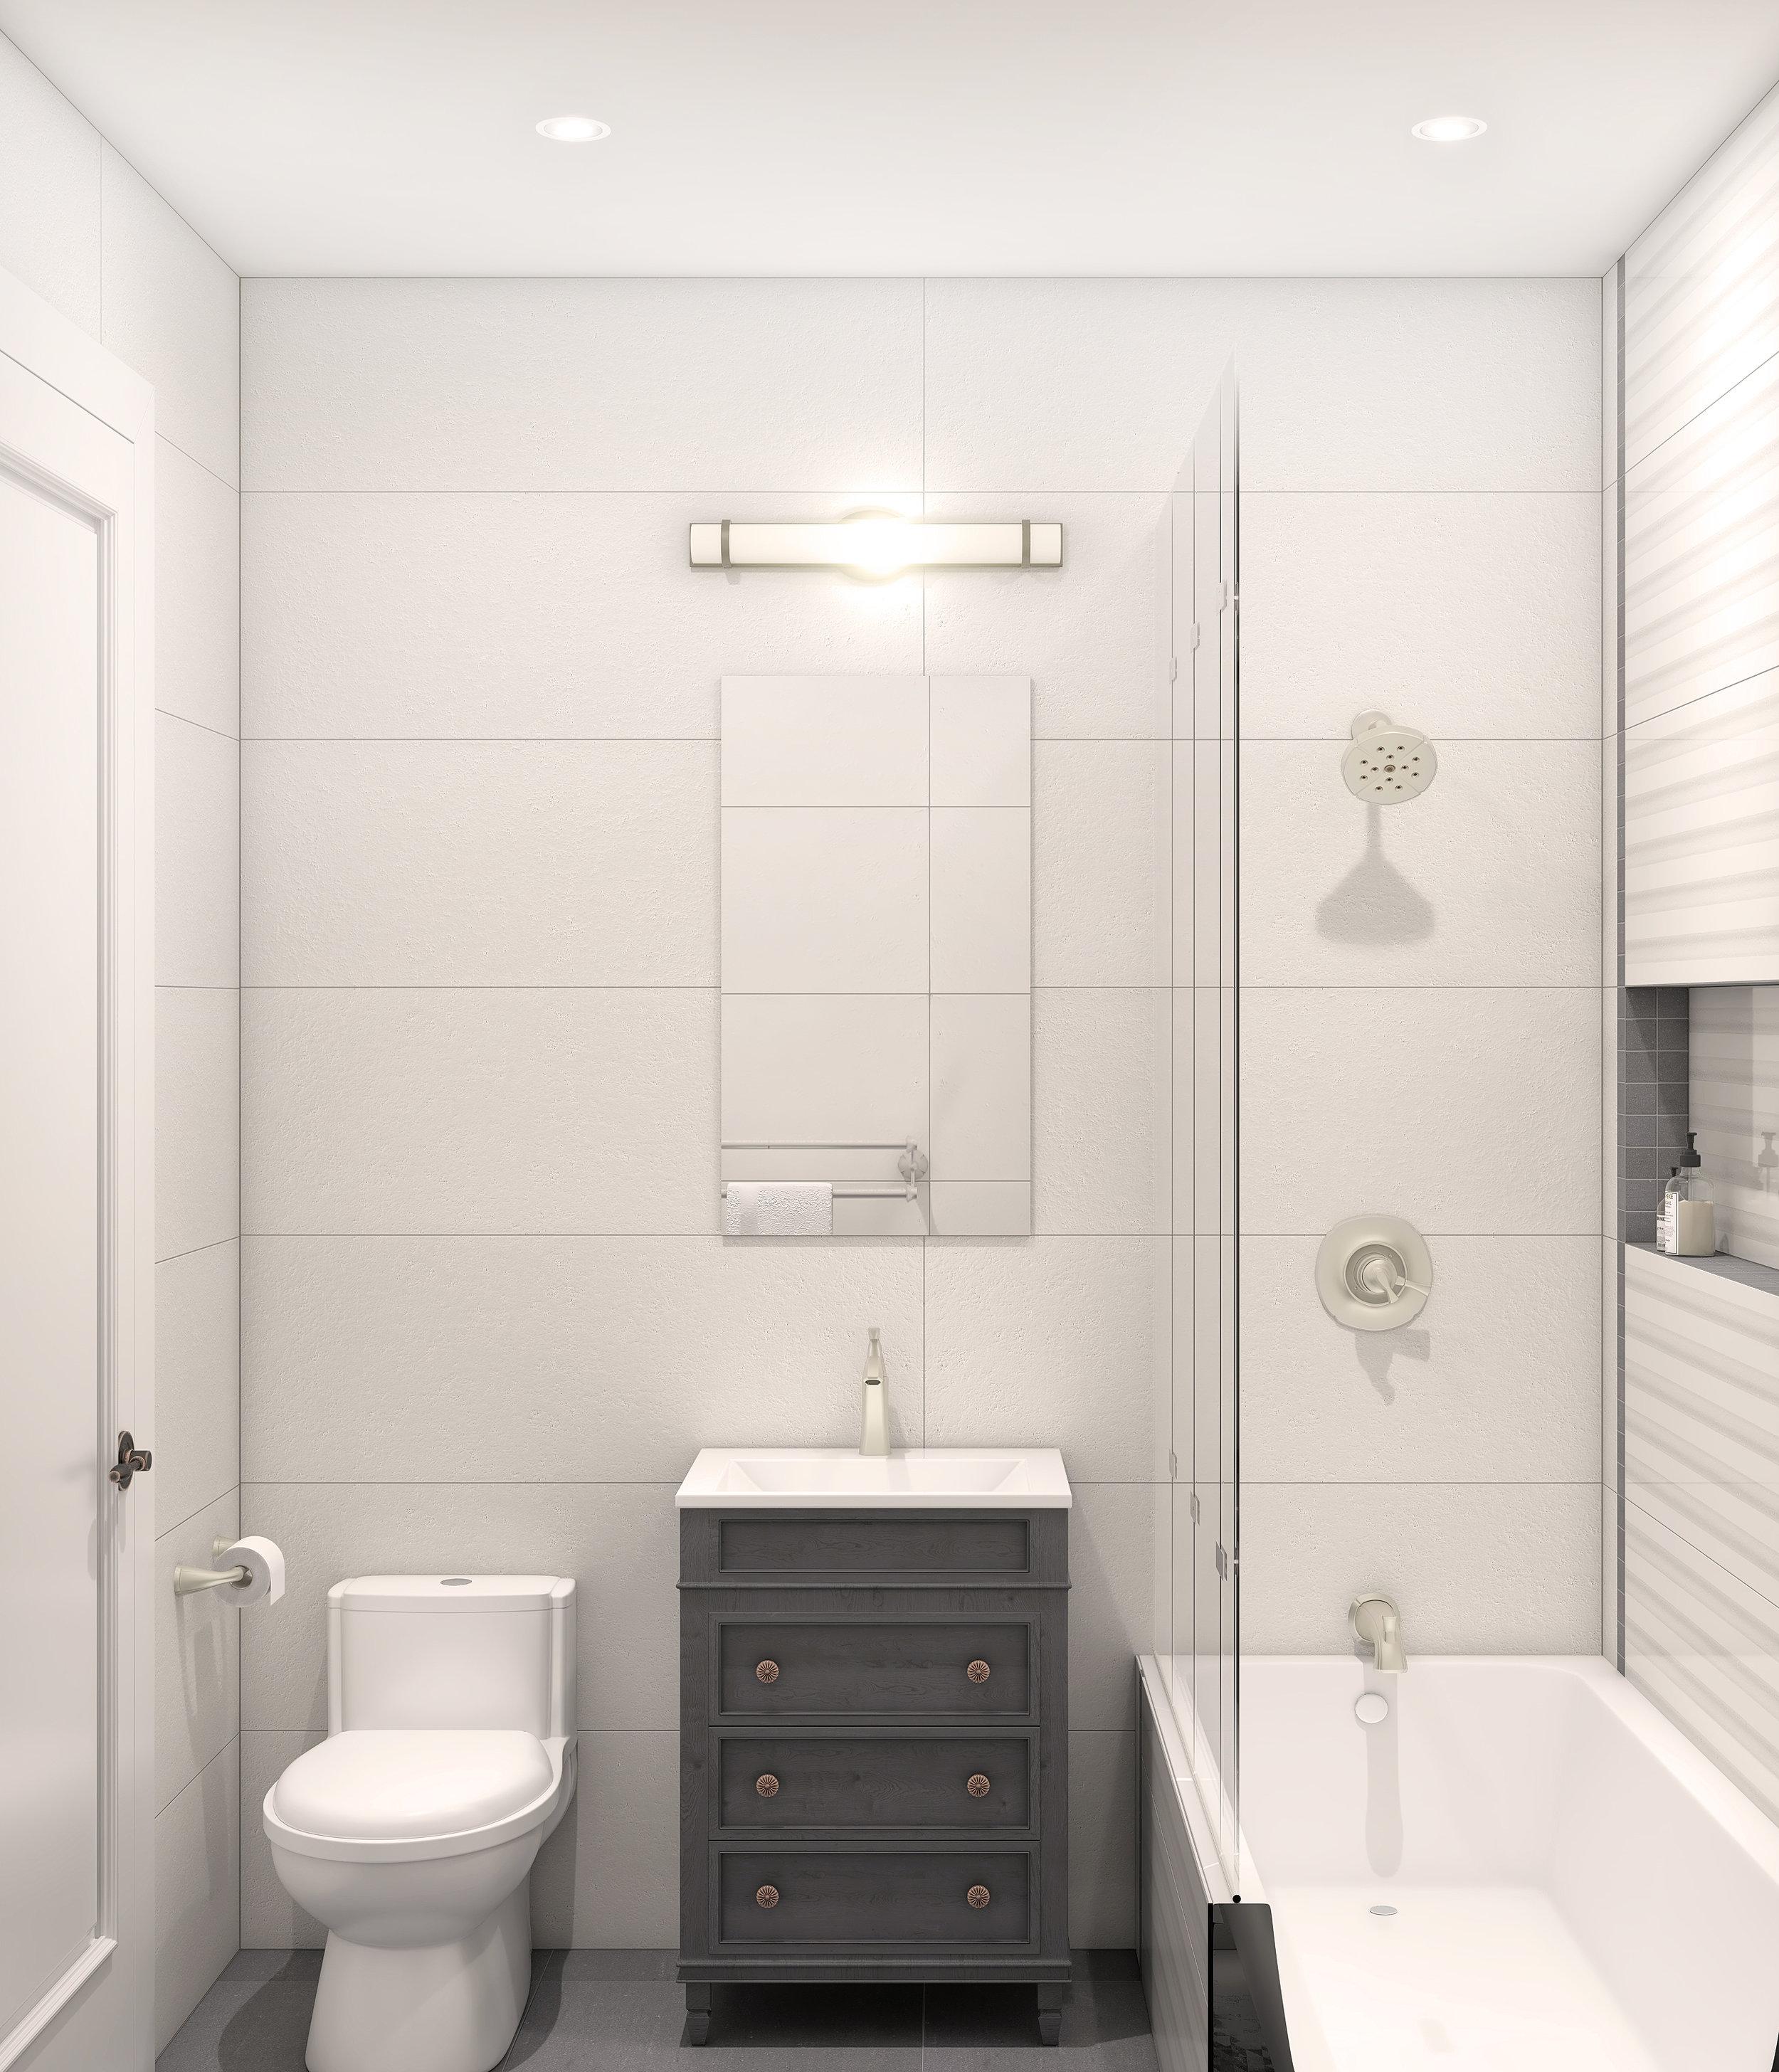 14-bathroom-85-01.0003-300 dpi-edit.jpg